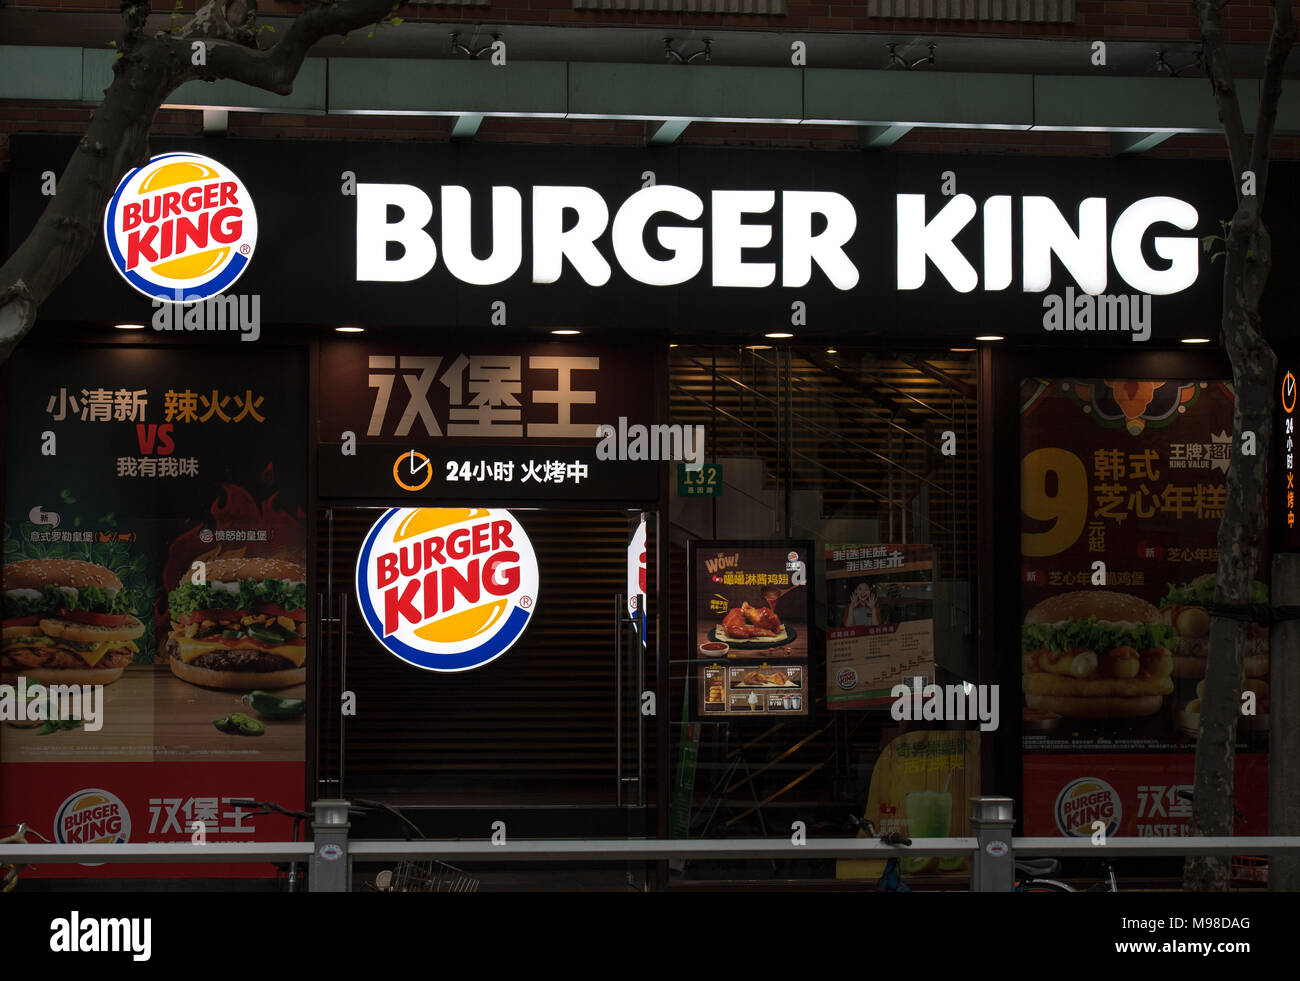 Burger King restaurant in Shanghai, China - Stock Image